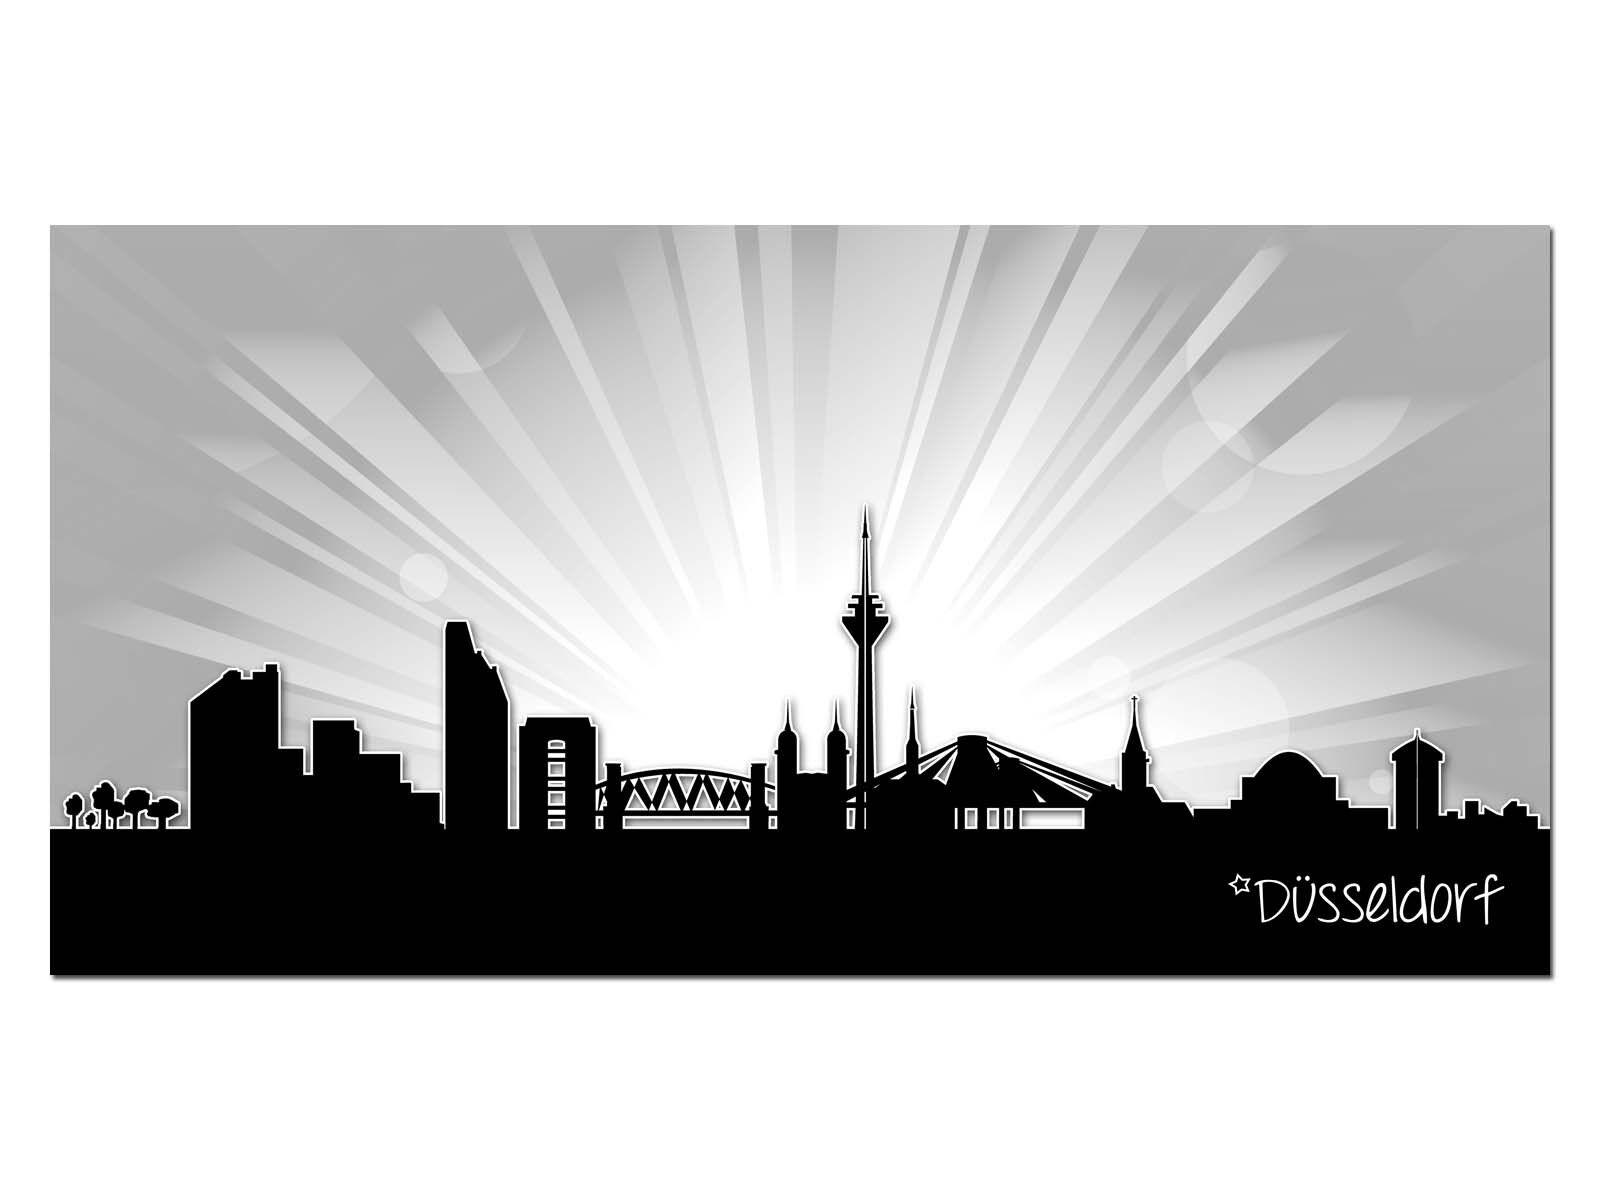 HD Glasbild EG4100500125 DÜSSELDORF SUNRISE GRAU 100 x 50 cm Wandbild STADT